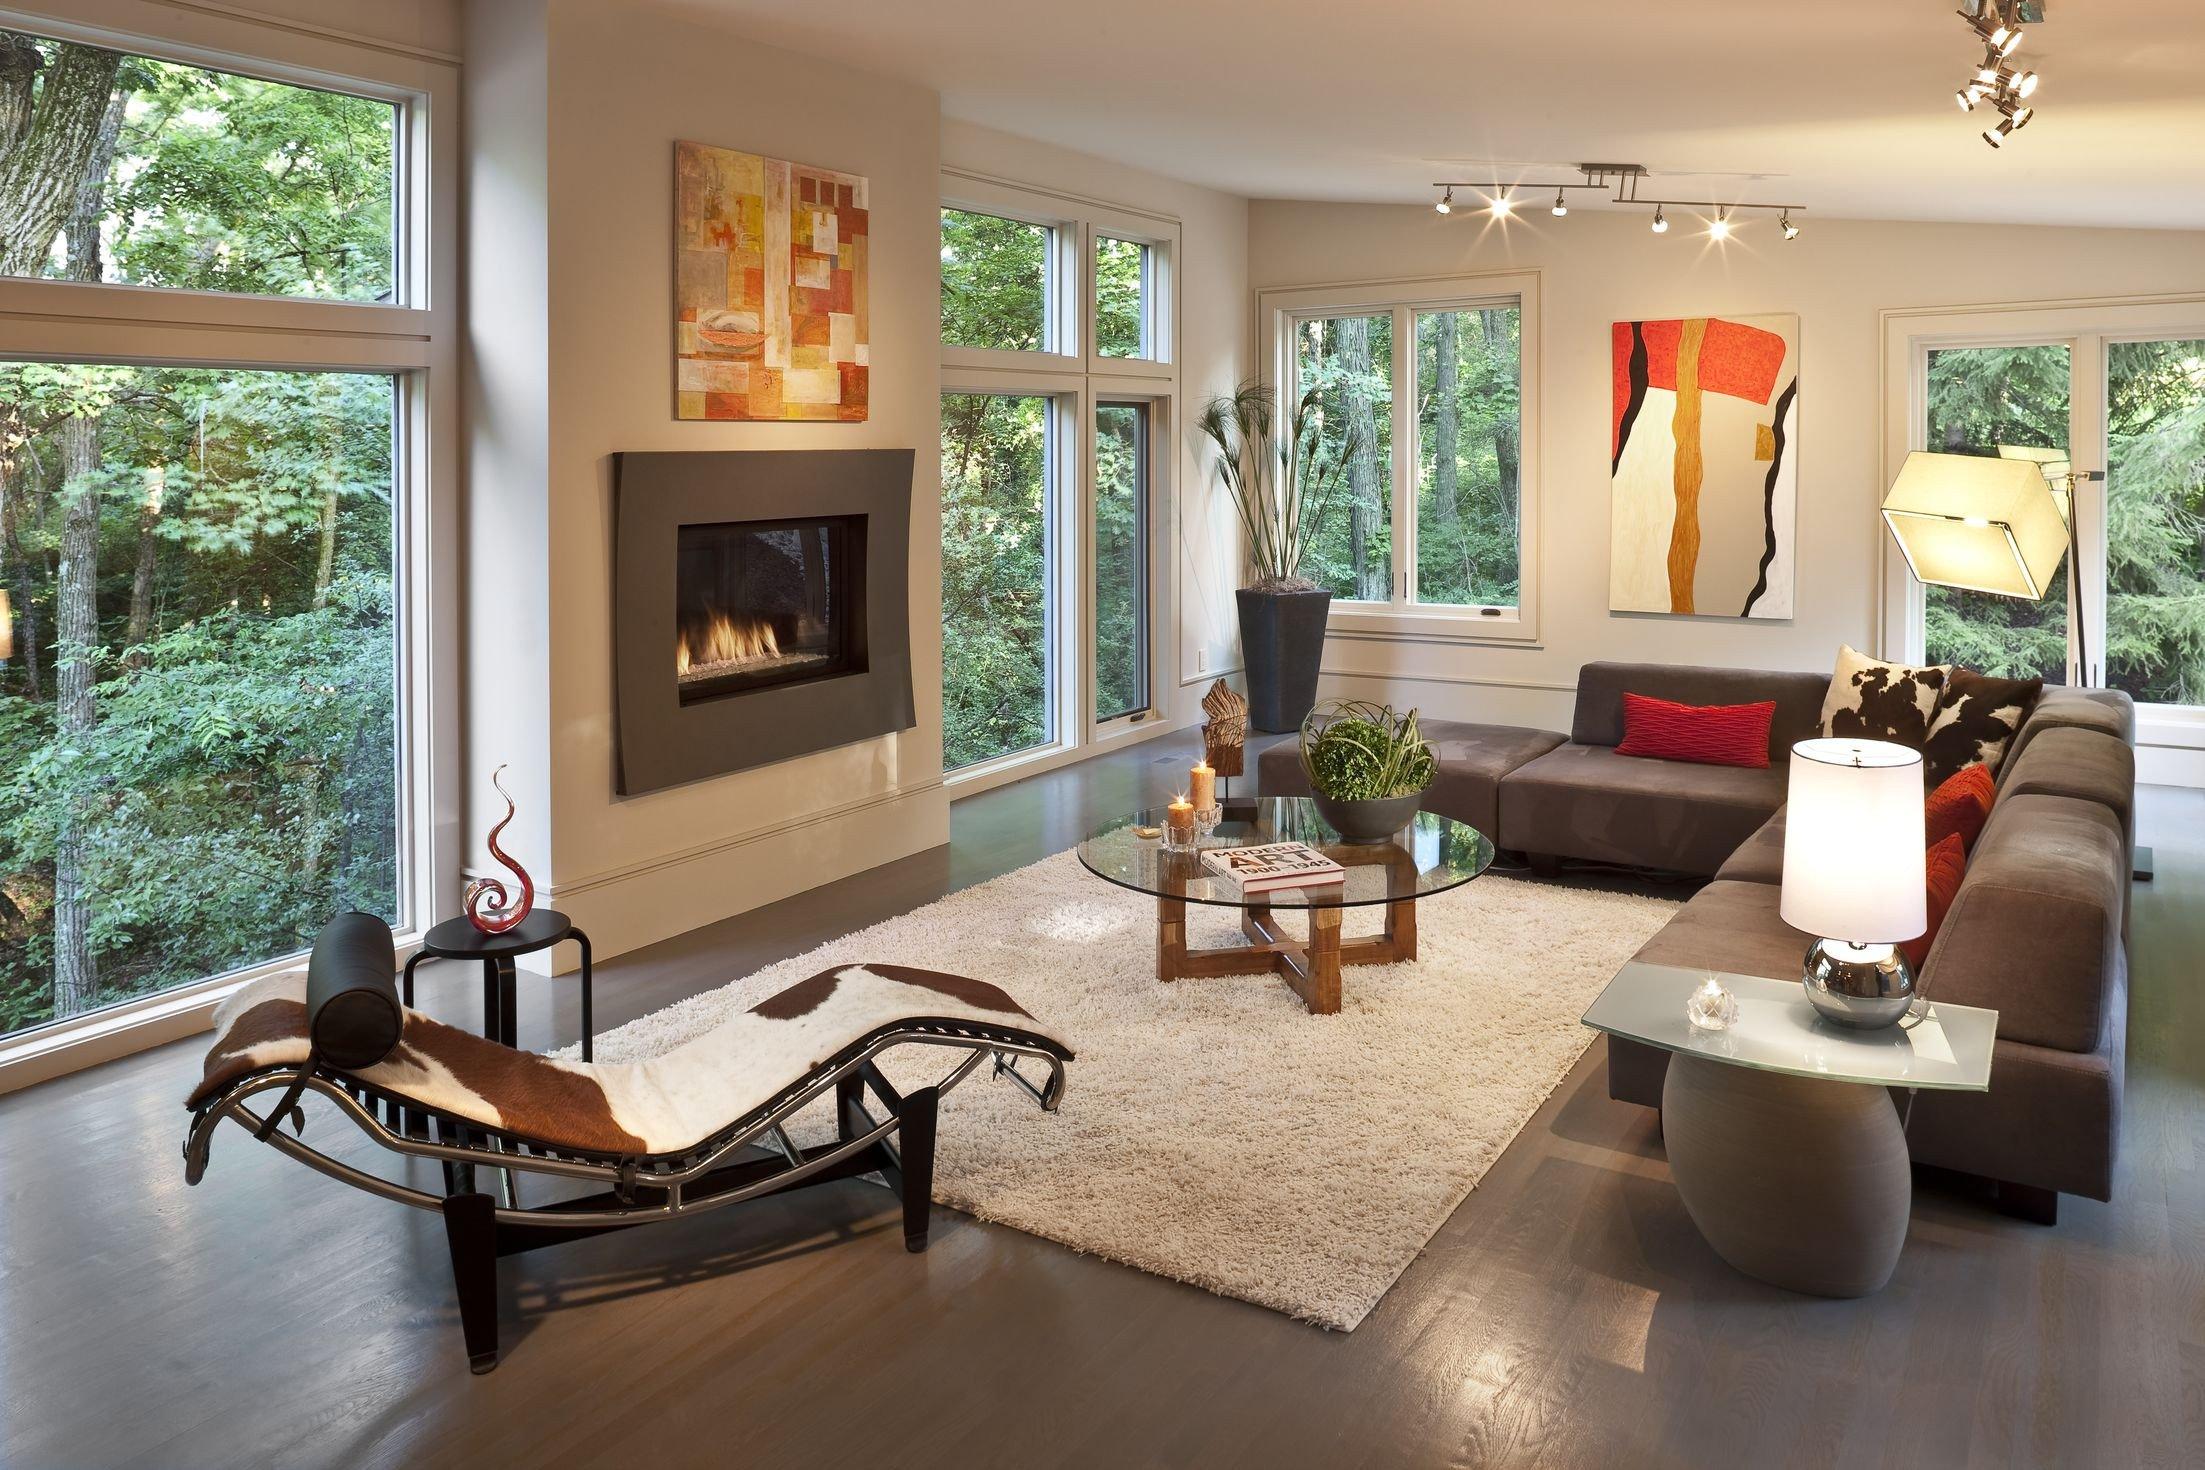 Comfortable Chairs Living Room Elegant top 4 fortable Chairs for Living Room